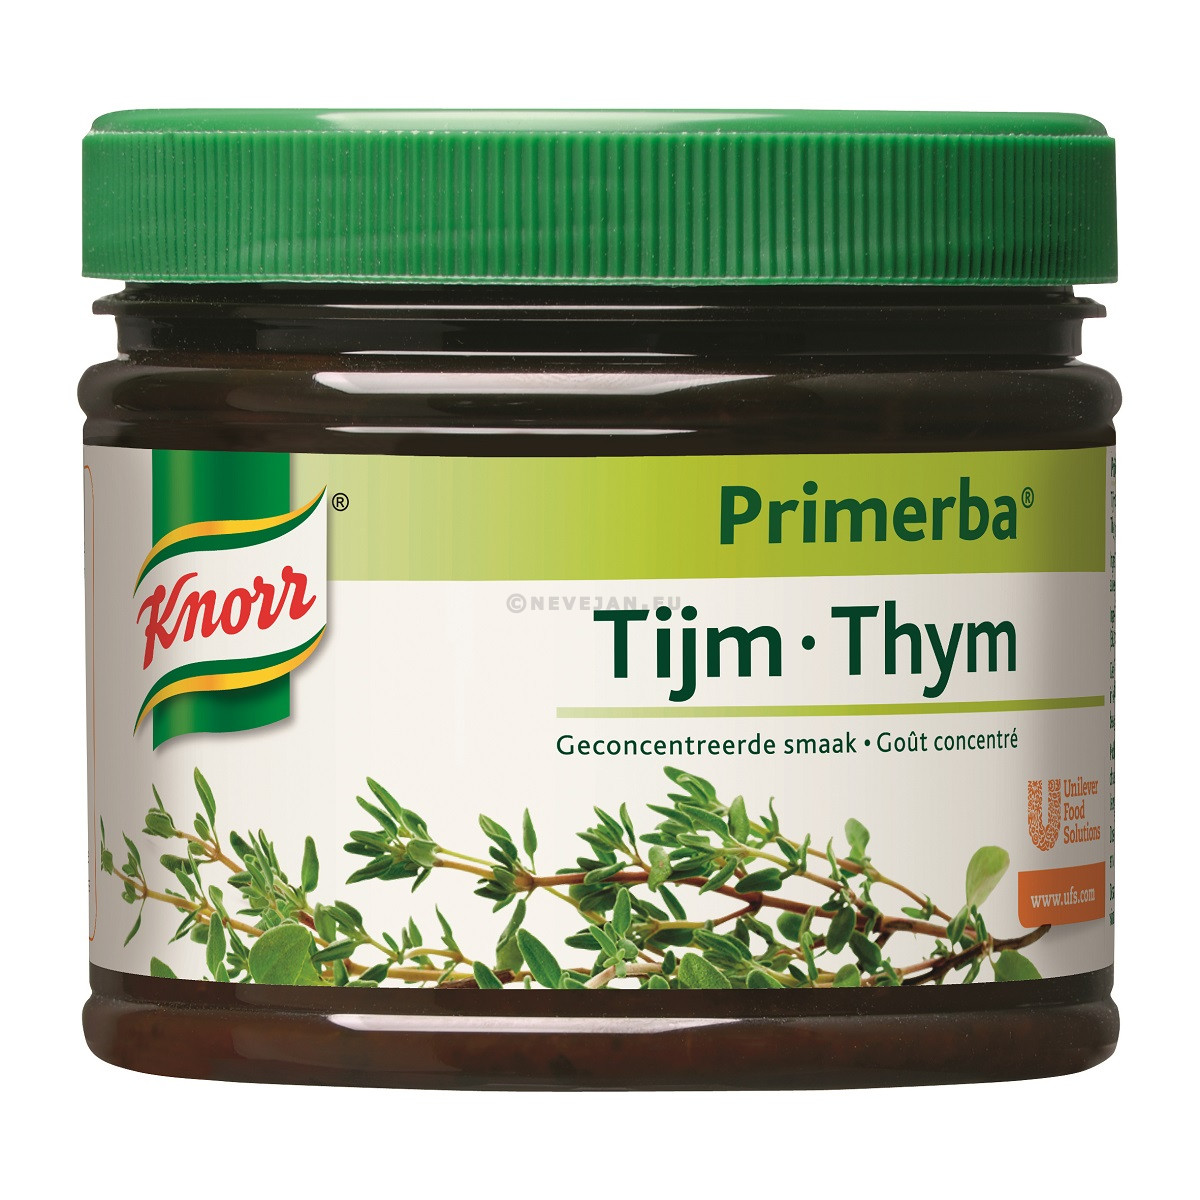 Knorr Primerba thym 340gr